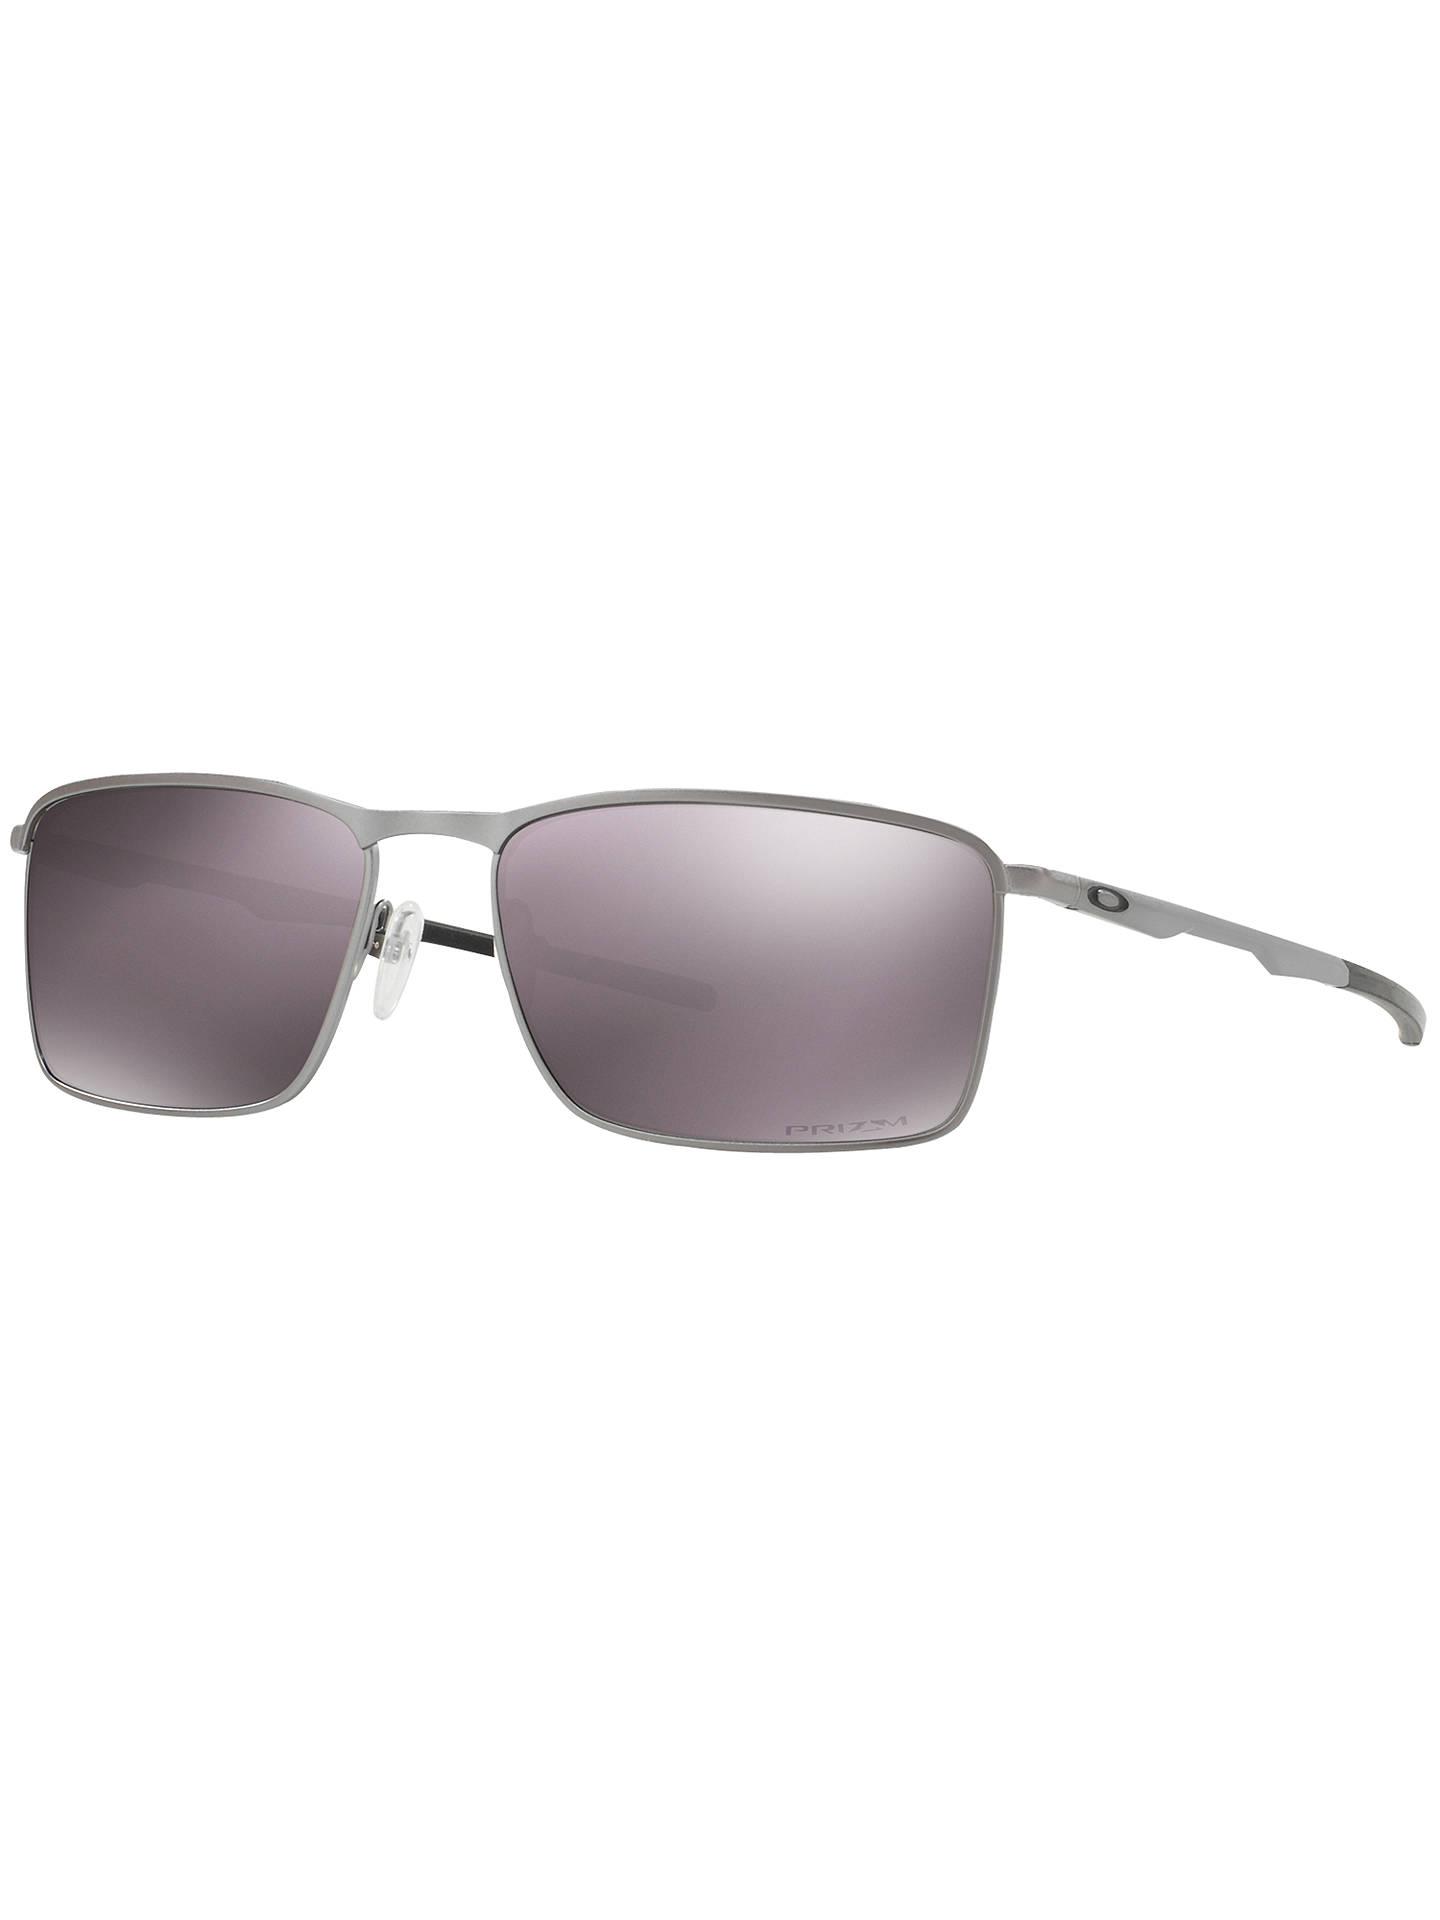 57398b4f3355 Oakley OO4106 Conductor 6 Prizm Polarised Rectangular Sunglasses ...